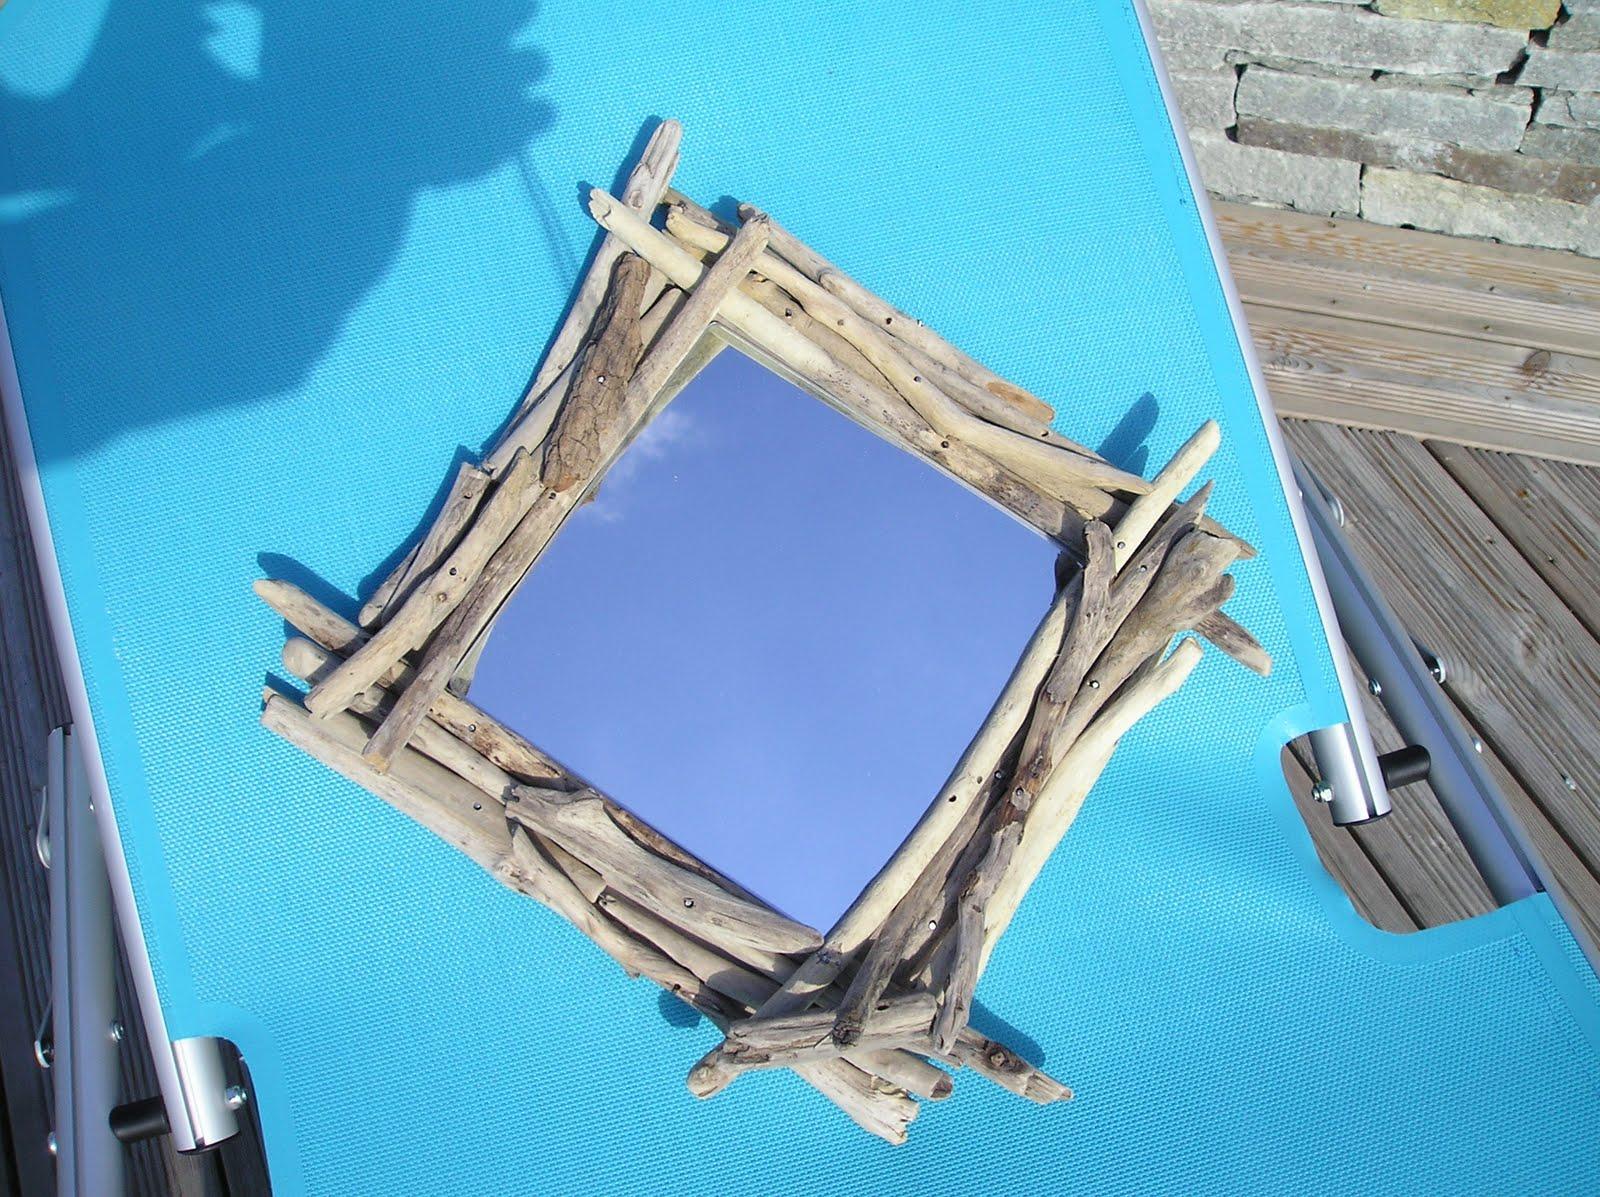 Art d co bois flott cr ation miroirs en bois flott for Miroir cadre bois flotte